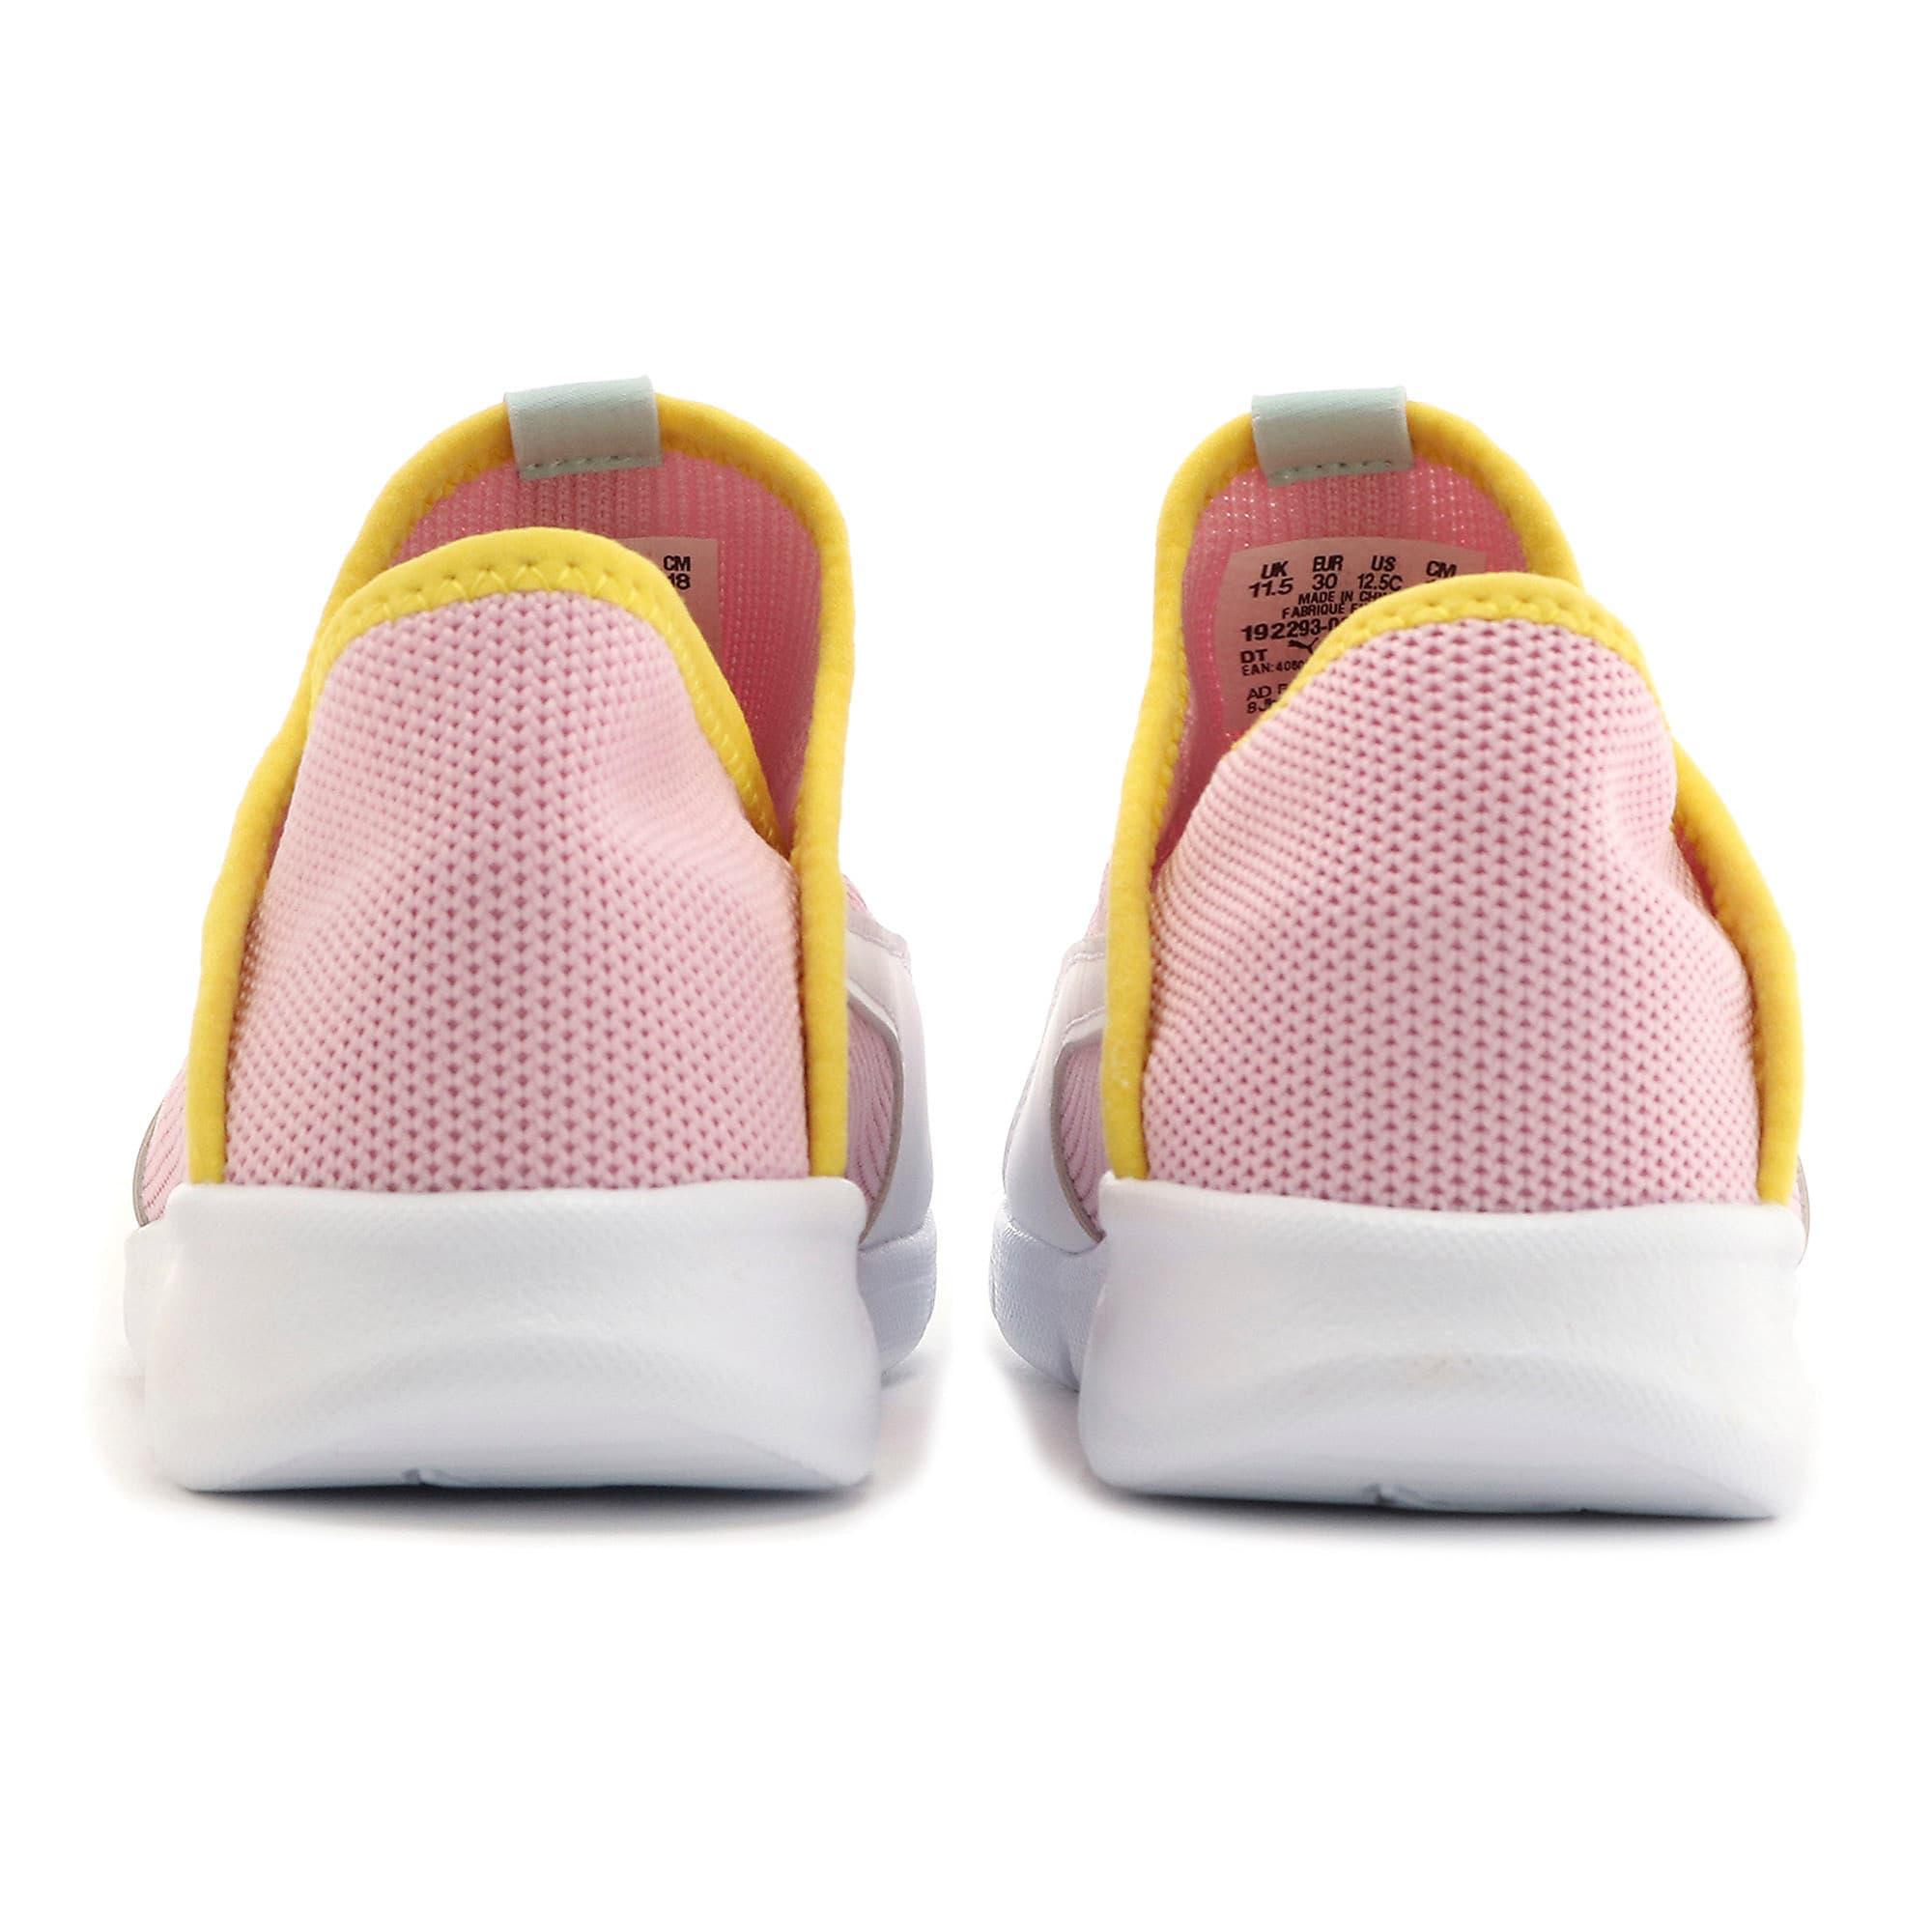 Thumbnail 3 of キッズ プーマ バオ 3 ソック PS 17-21cm, Pale Pink-White-Blazi Yellow, medium-JPN